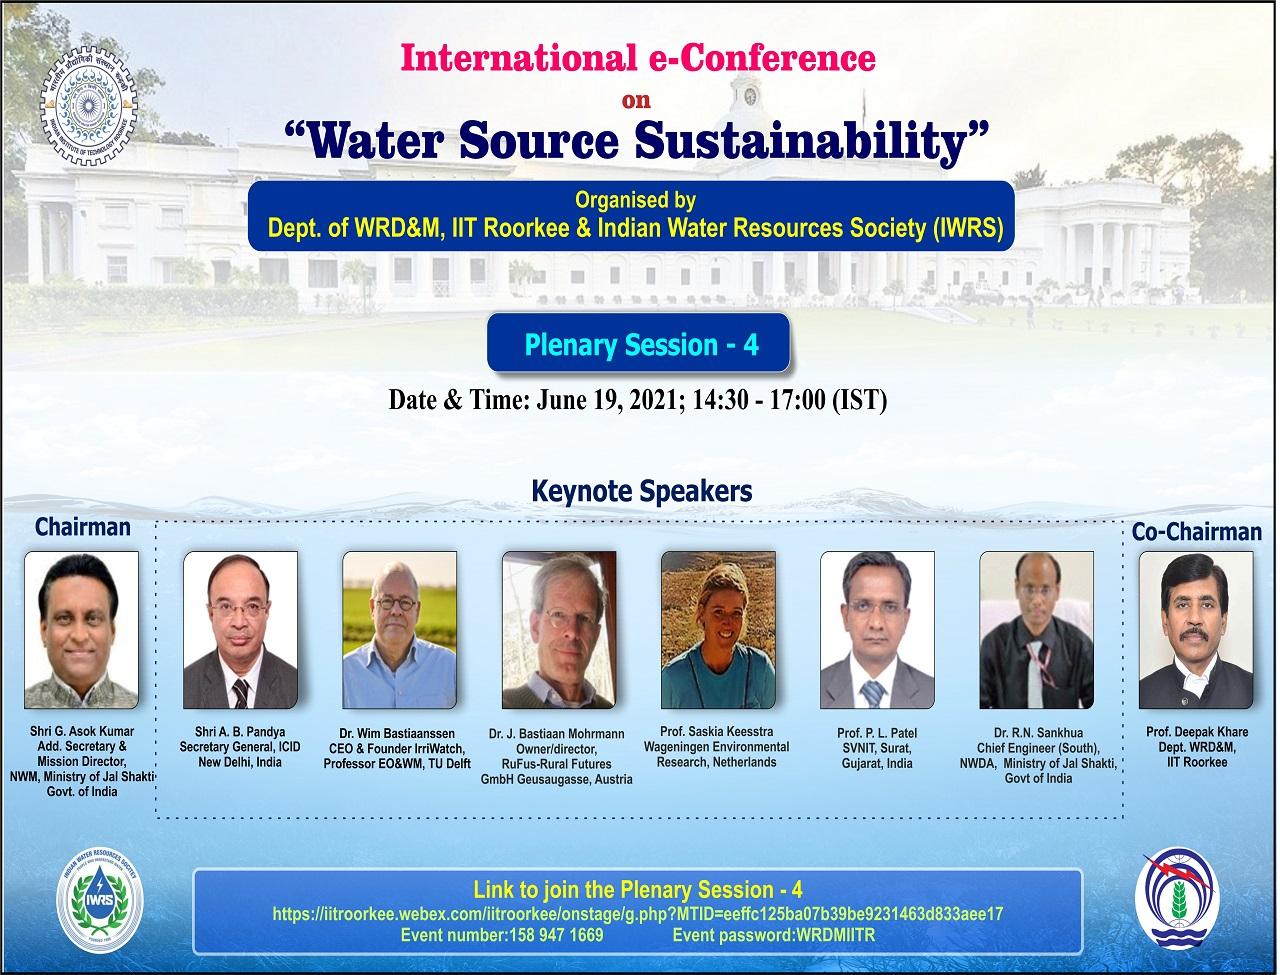 Plenary Session 4